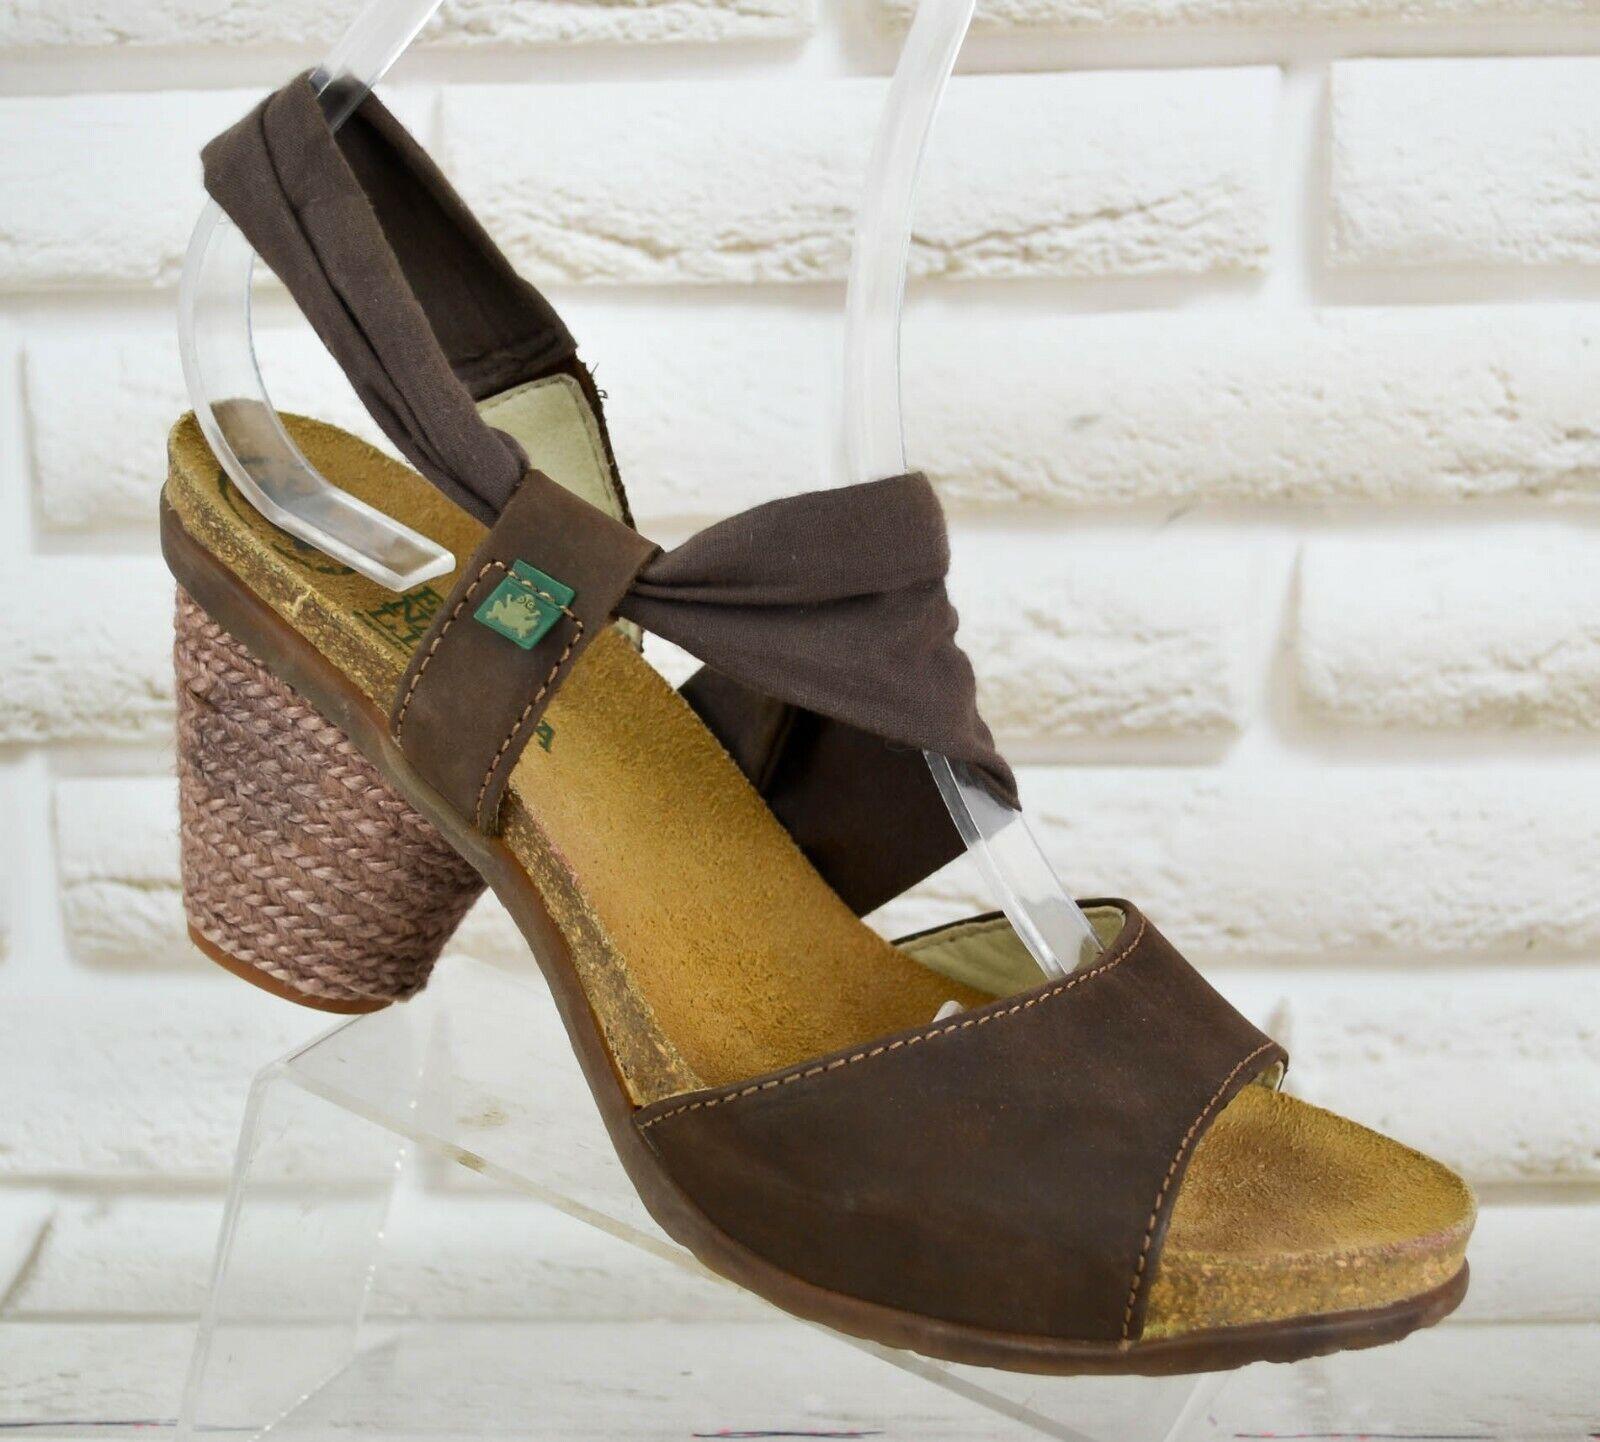 EL NATURALISTA SENDA Womens Leather Casual Heeled shoes Sandals Size 6 UK 39 EU